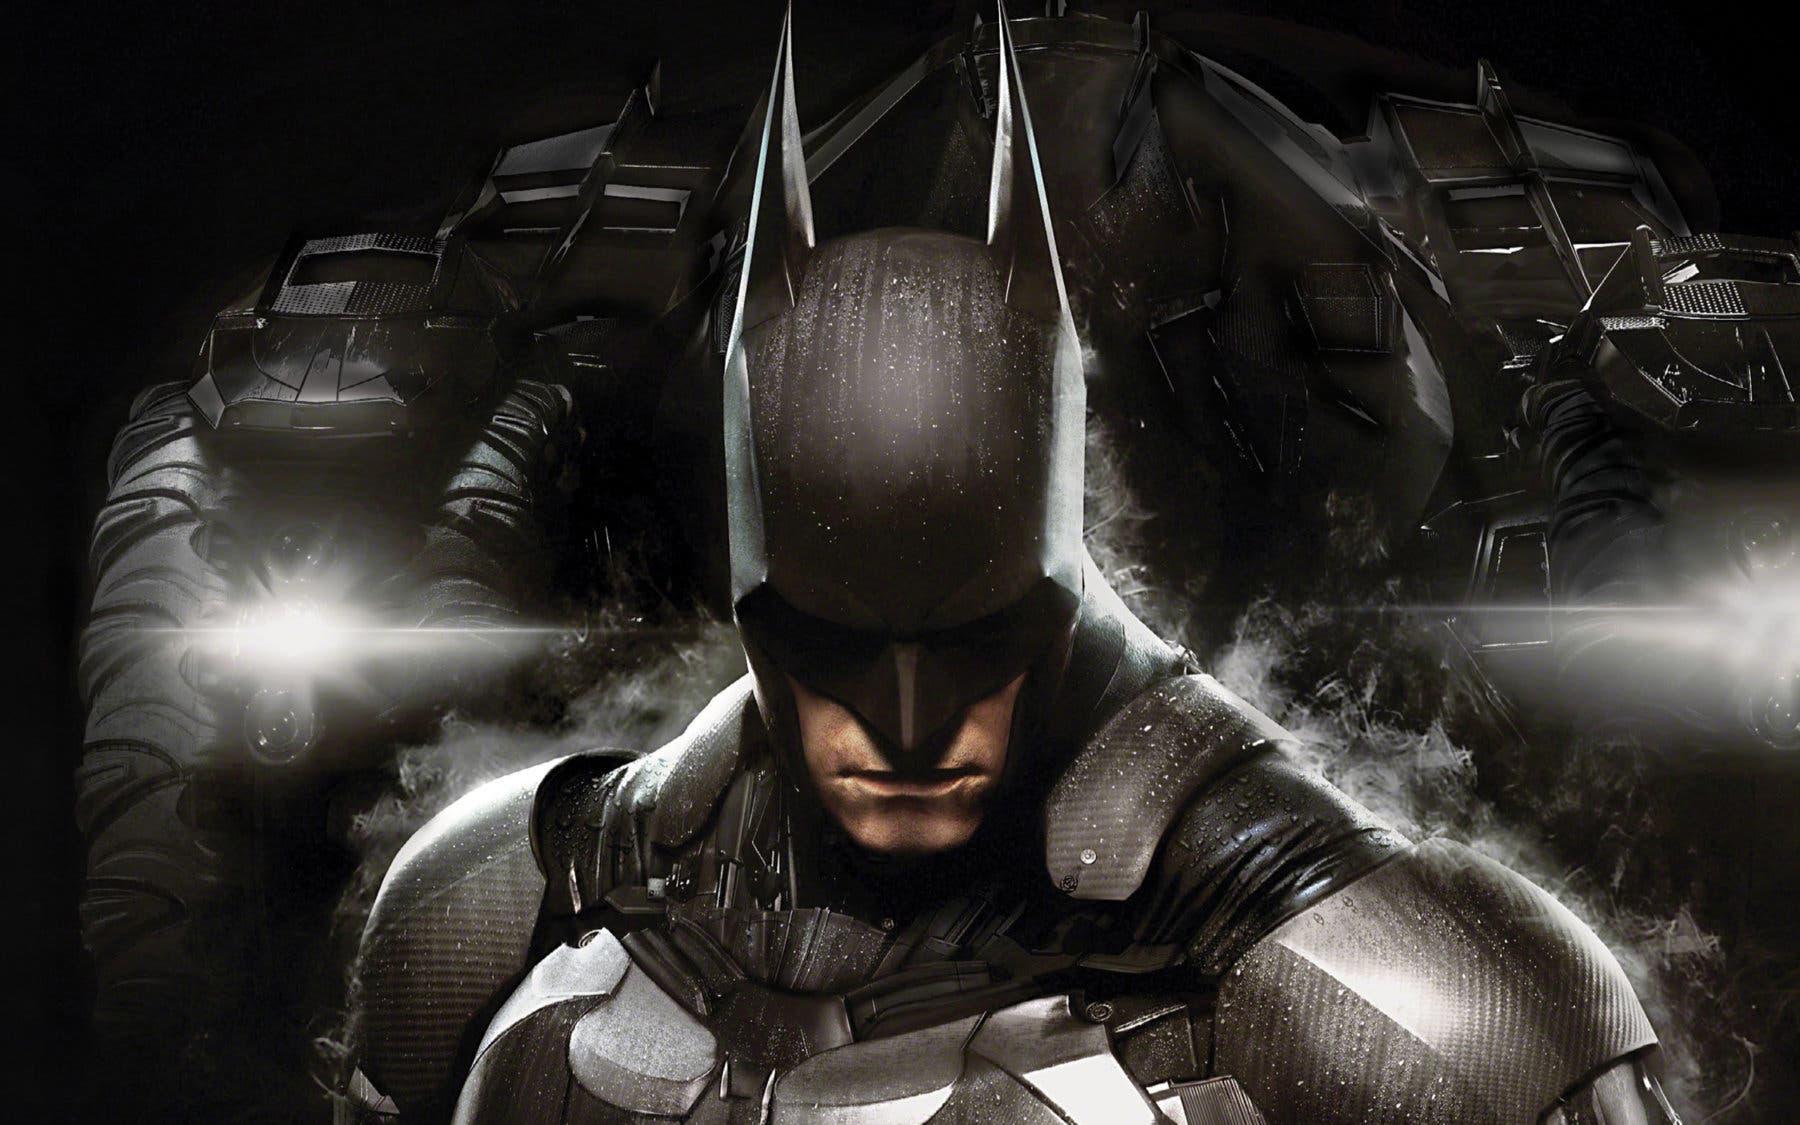 2014_batman_arkham_knight-wide